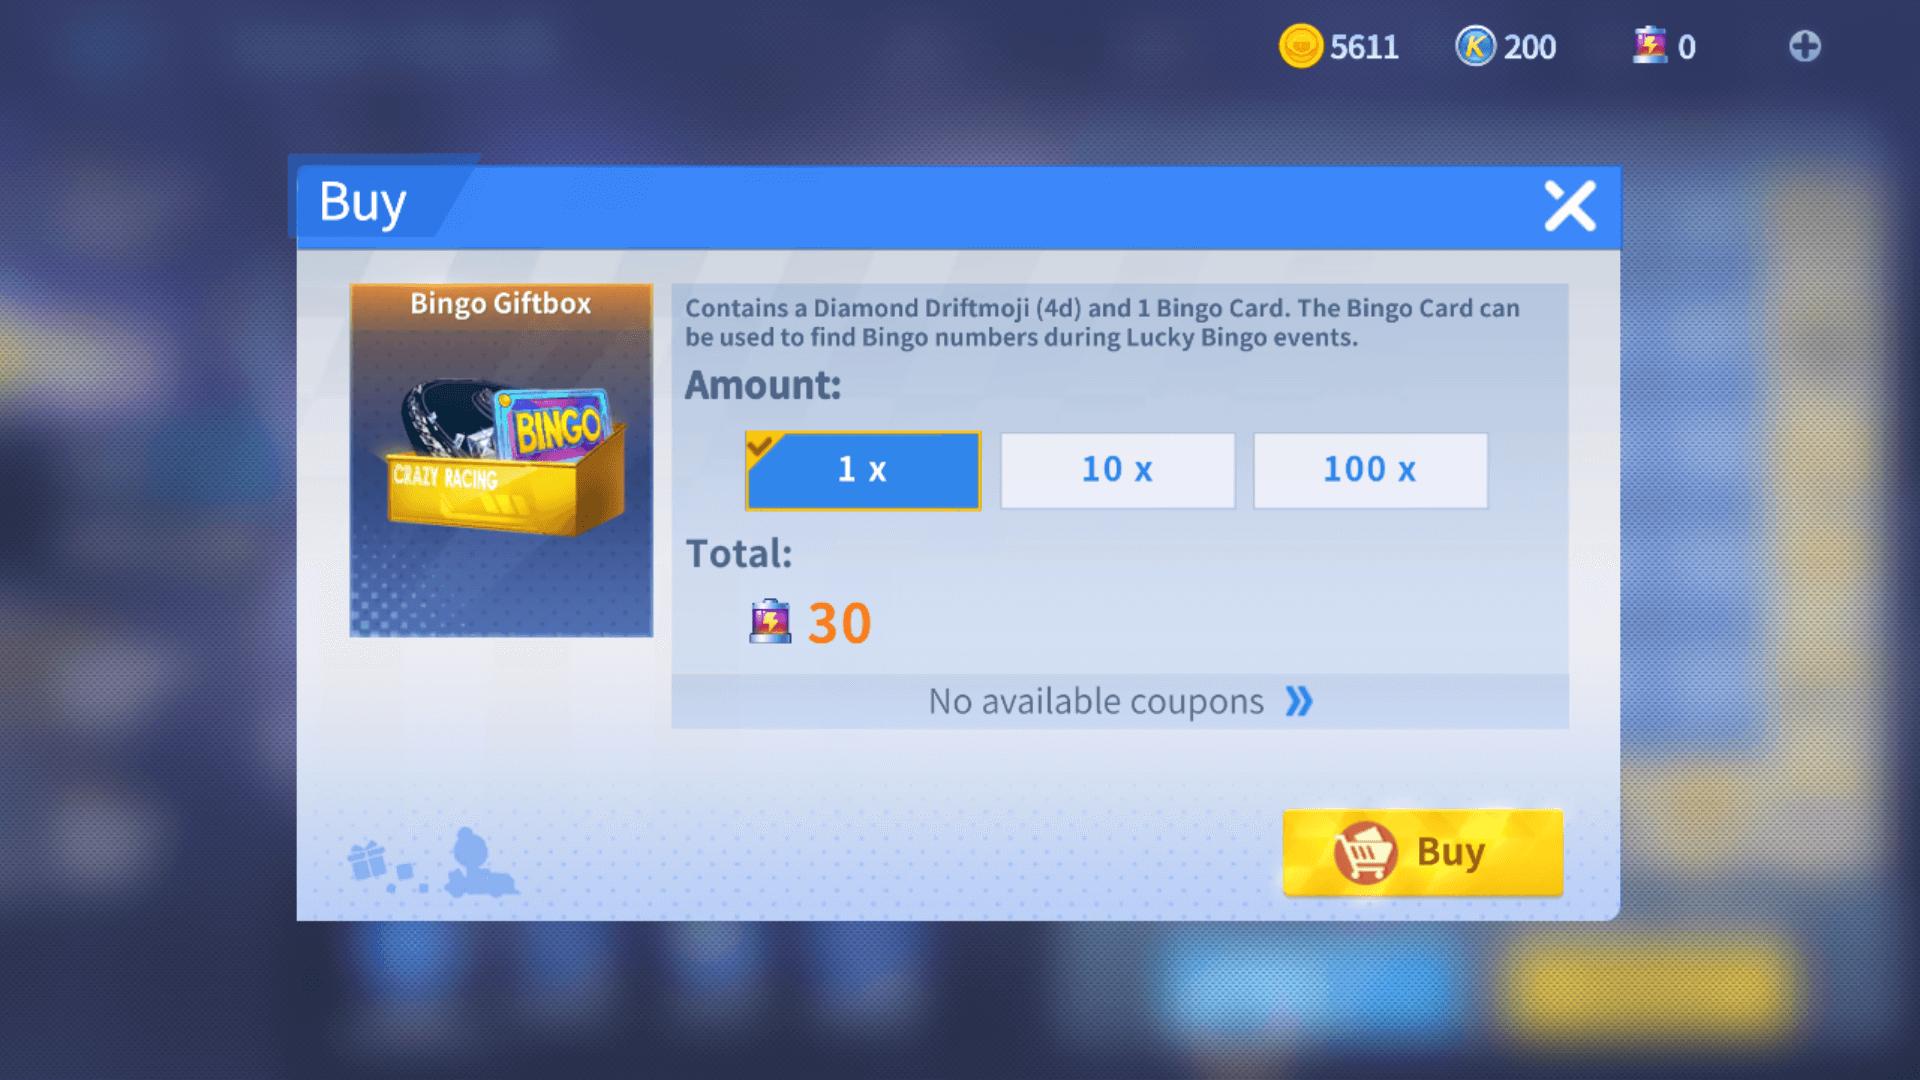 Buy Bingo Giftbox screenshot of KartRider Rush+ video game interface.